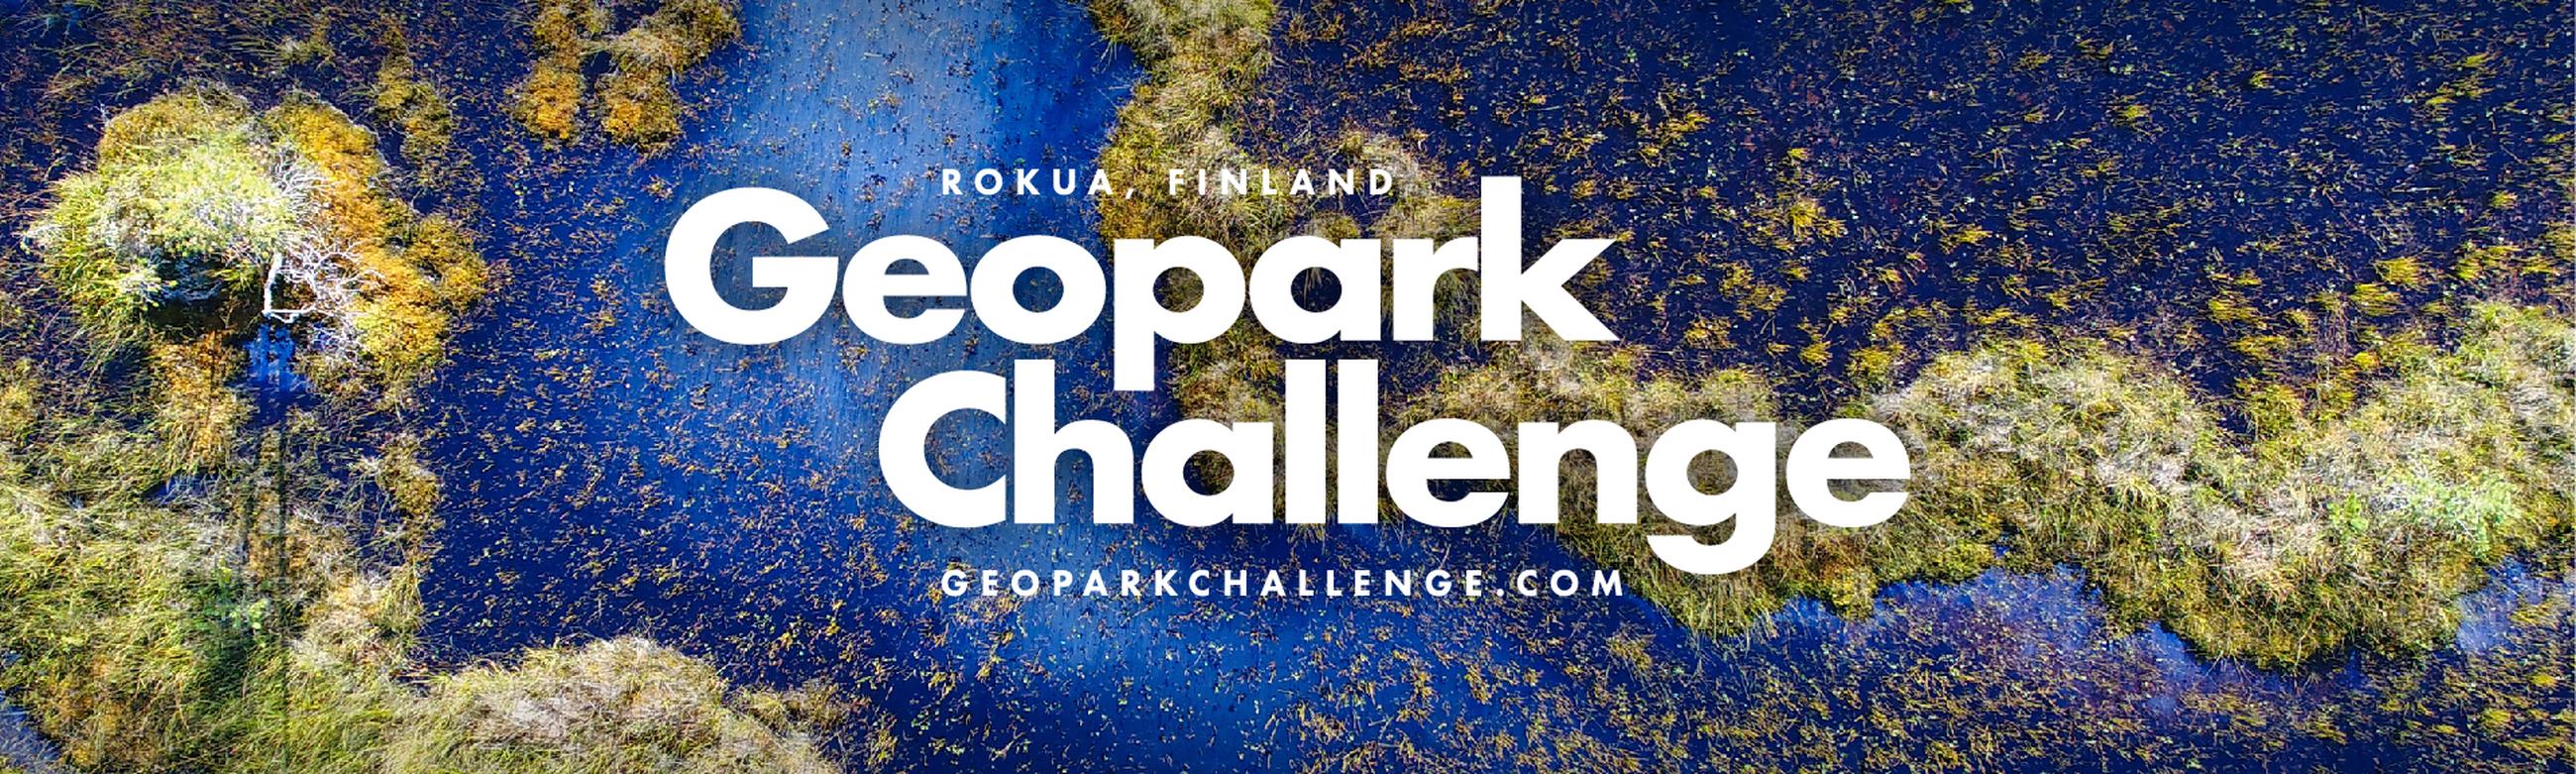 Rokua Geopark Challenge 2021